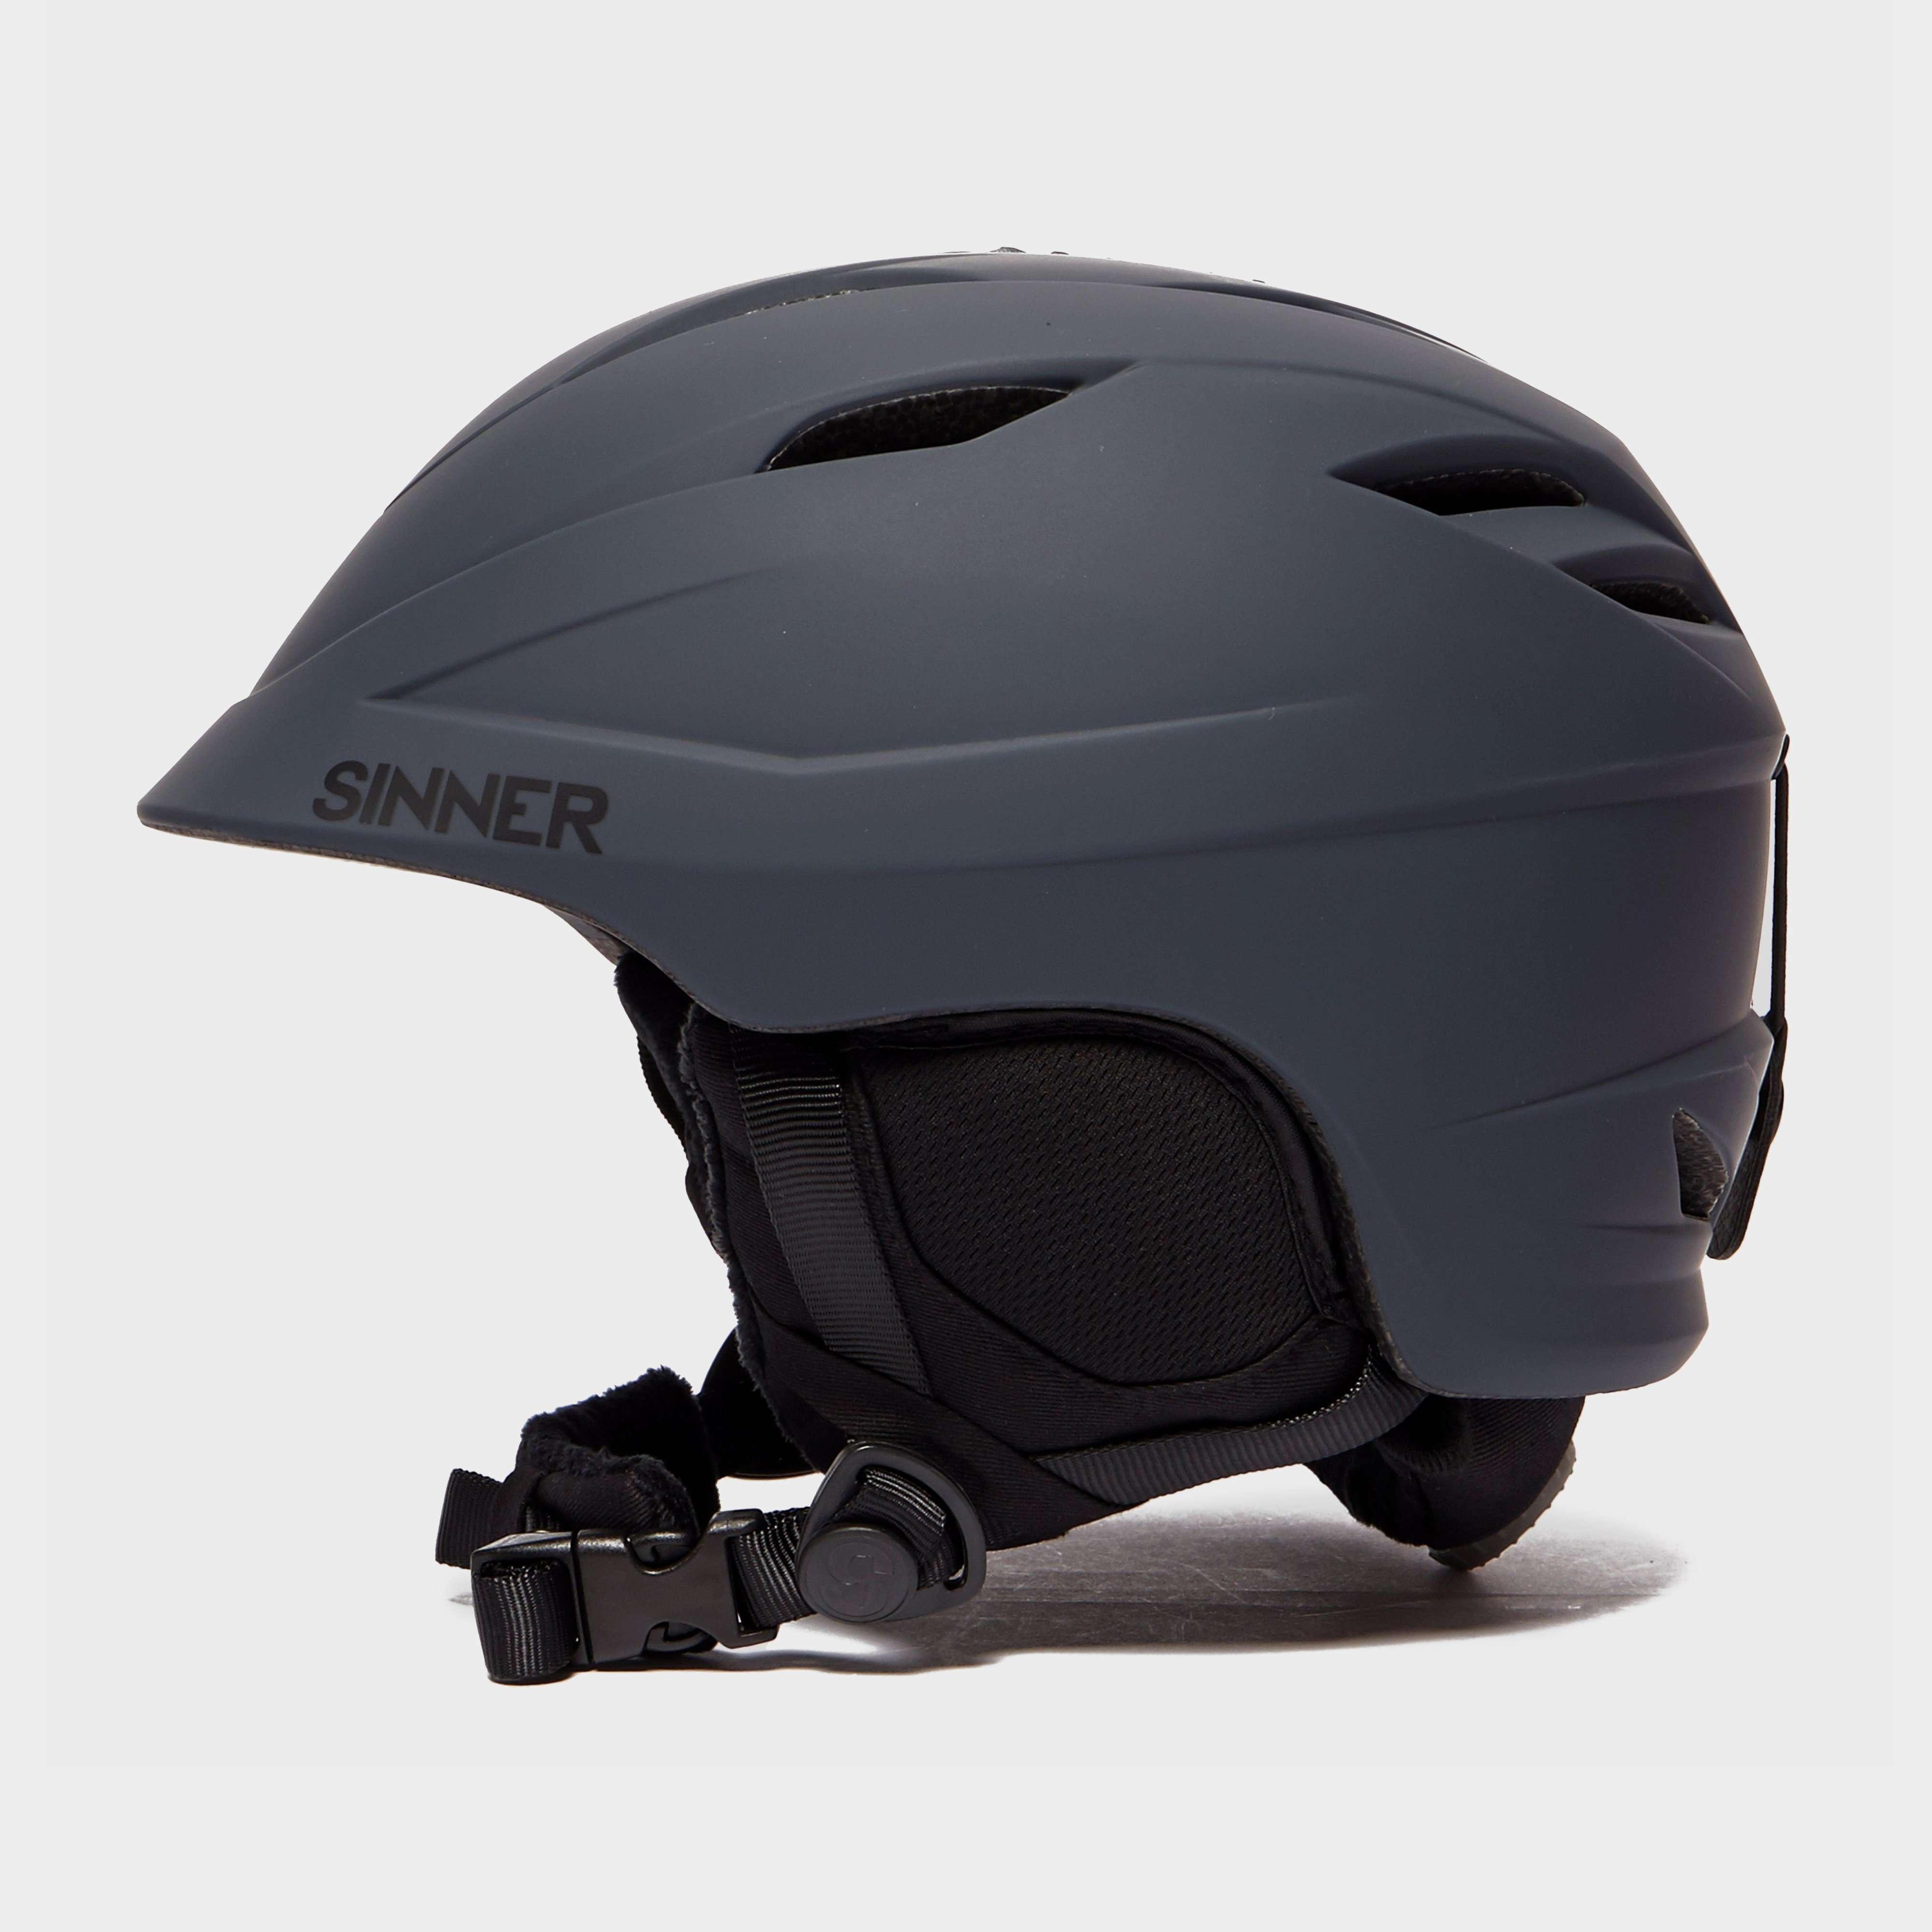 SINNER Gallix II Ski Helmet